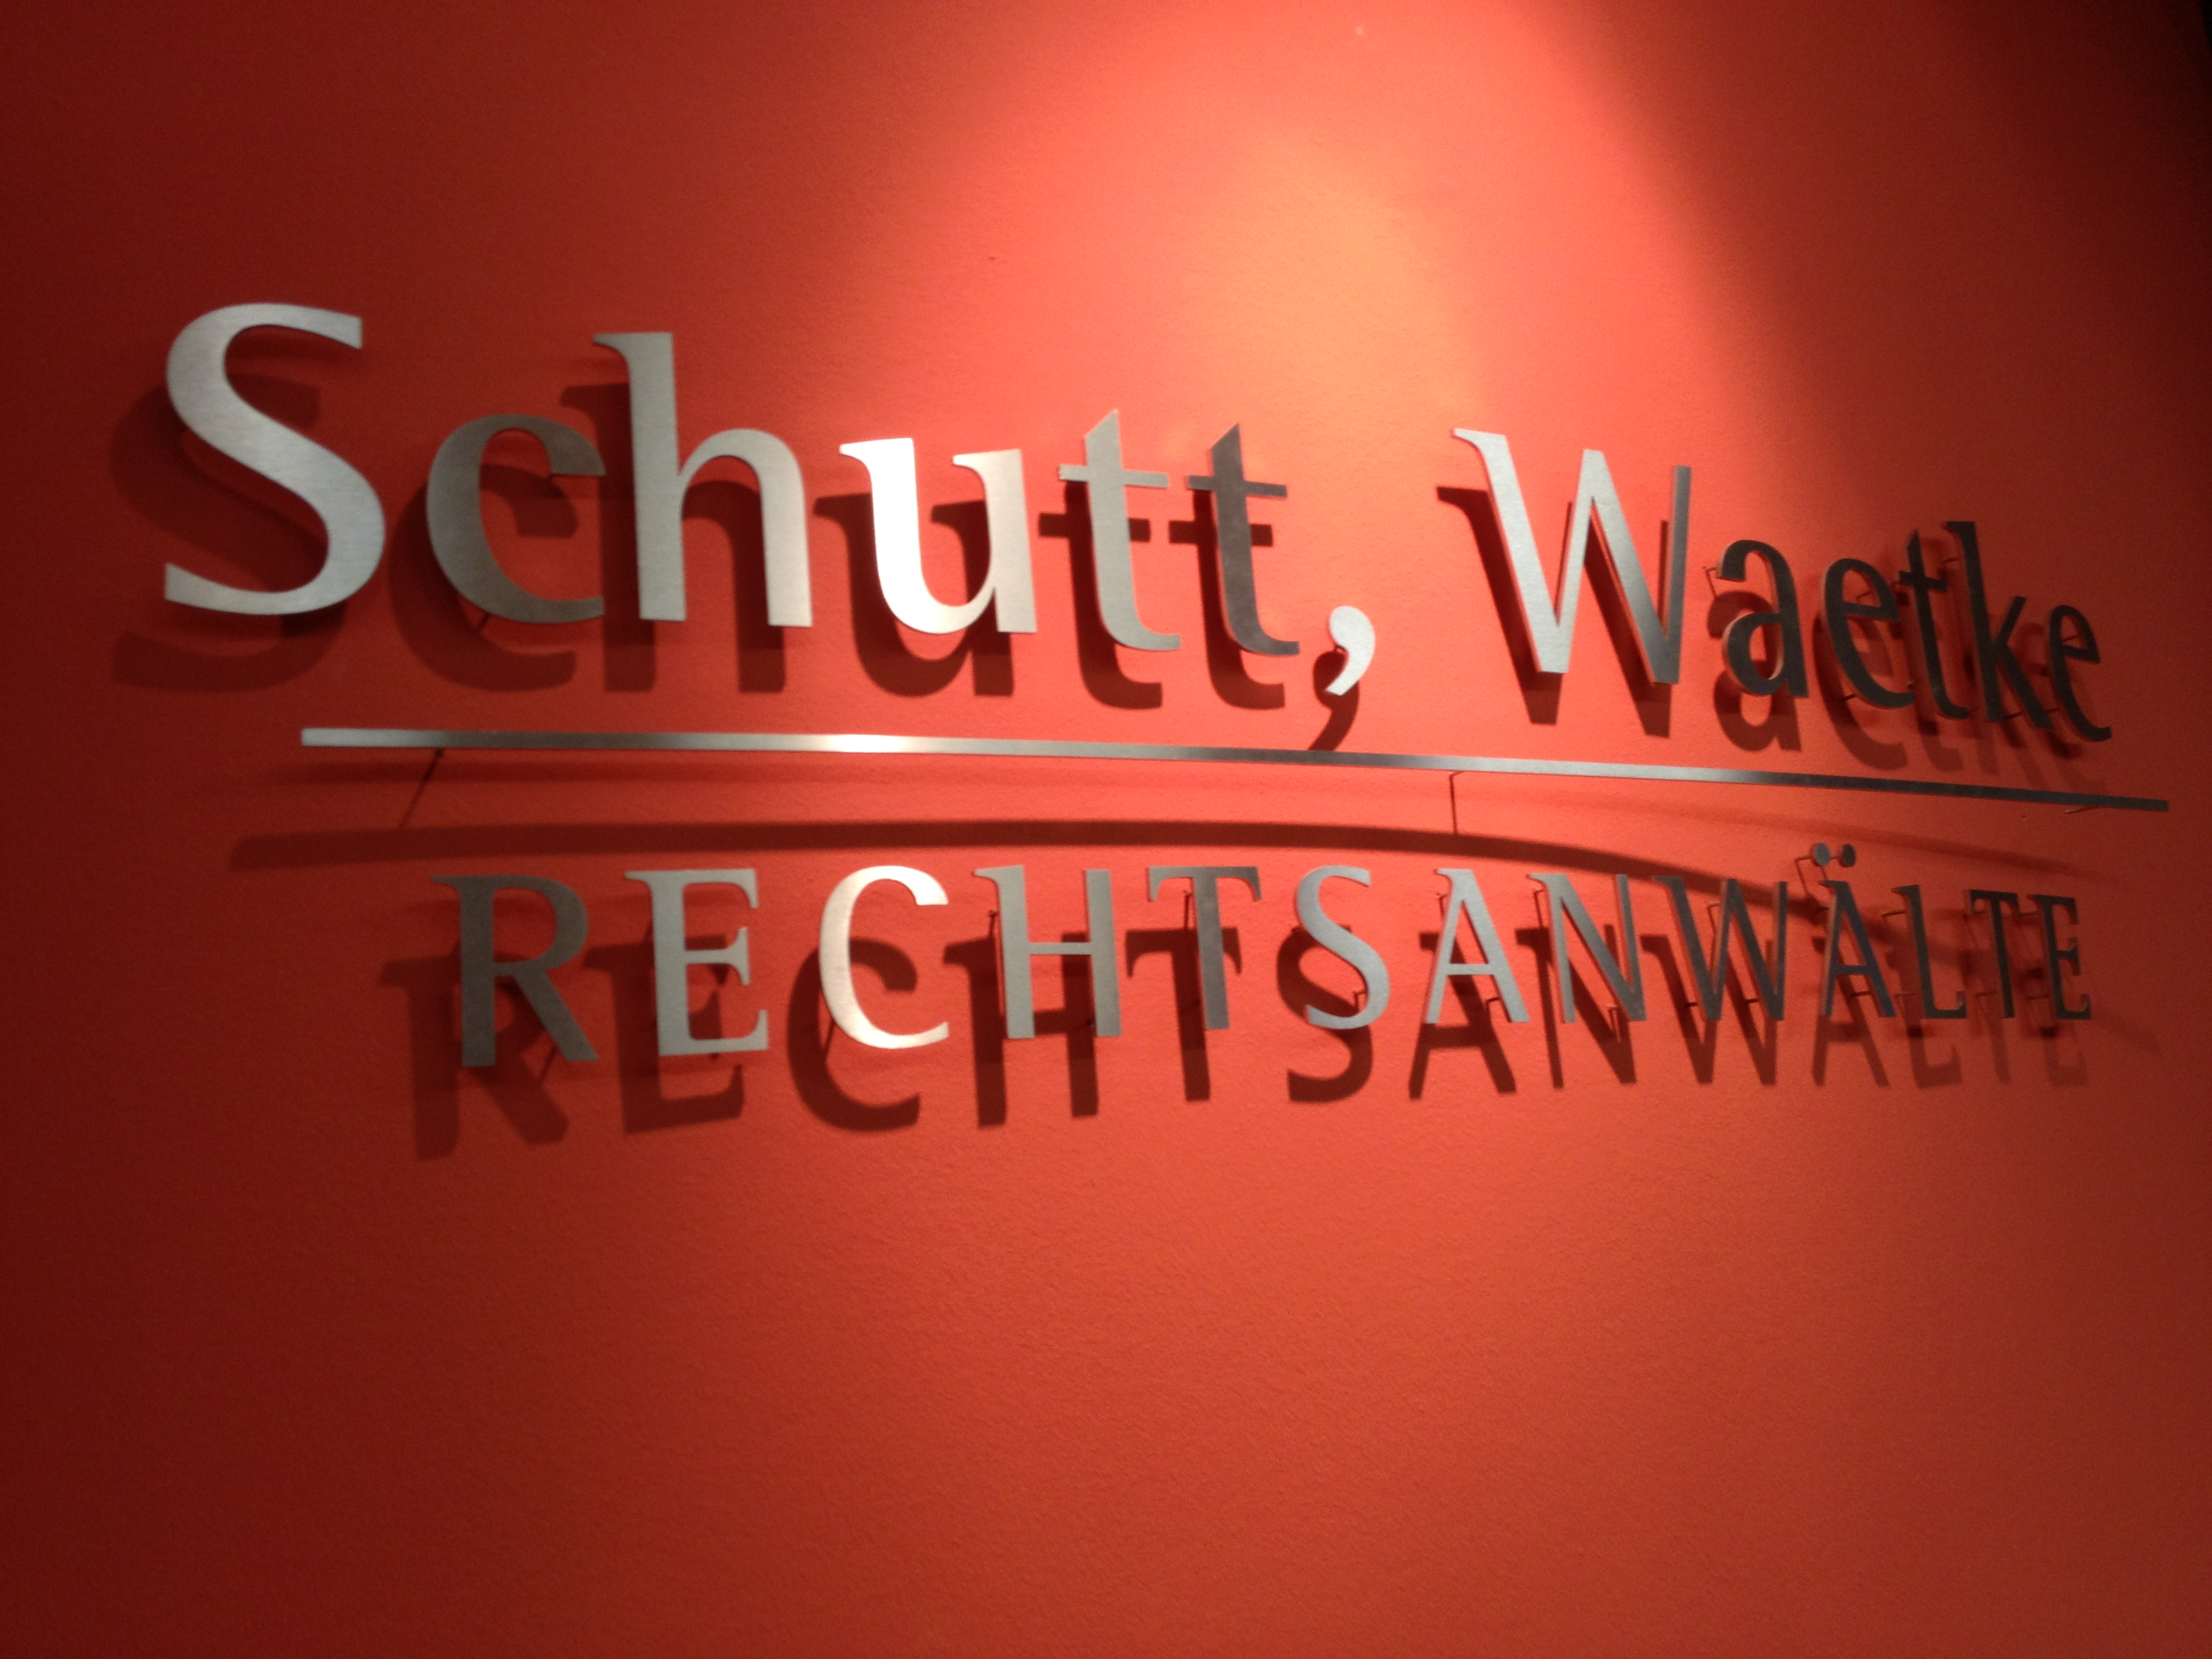 Schutt Waetke Rechtsanwälte